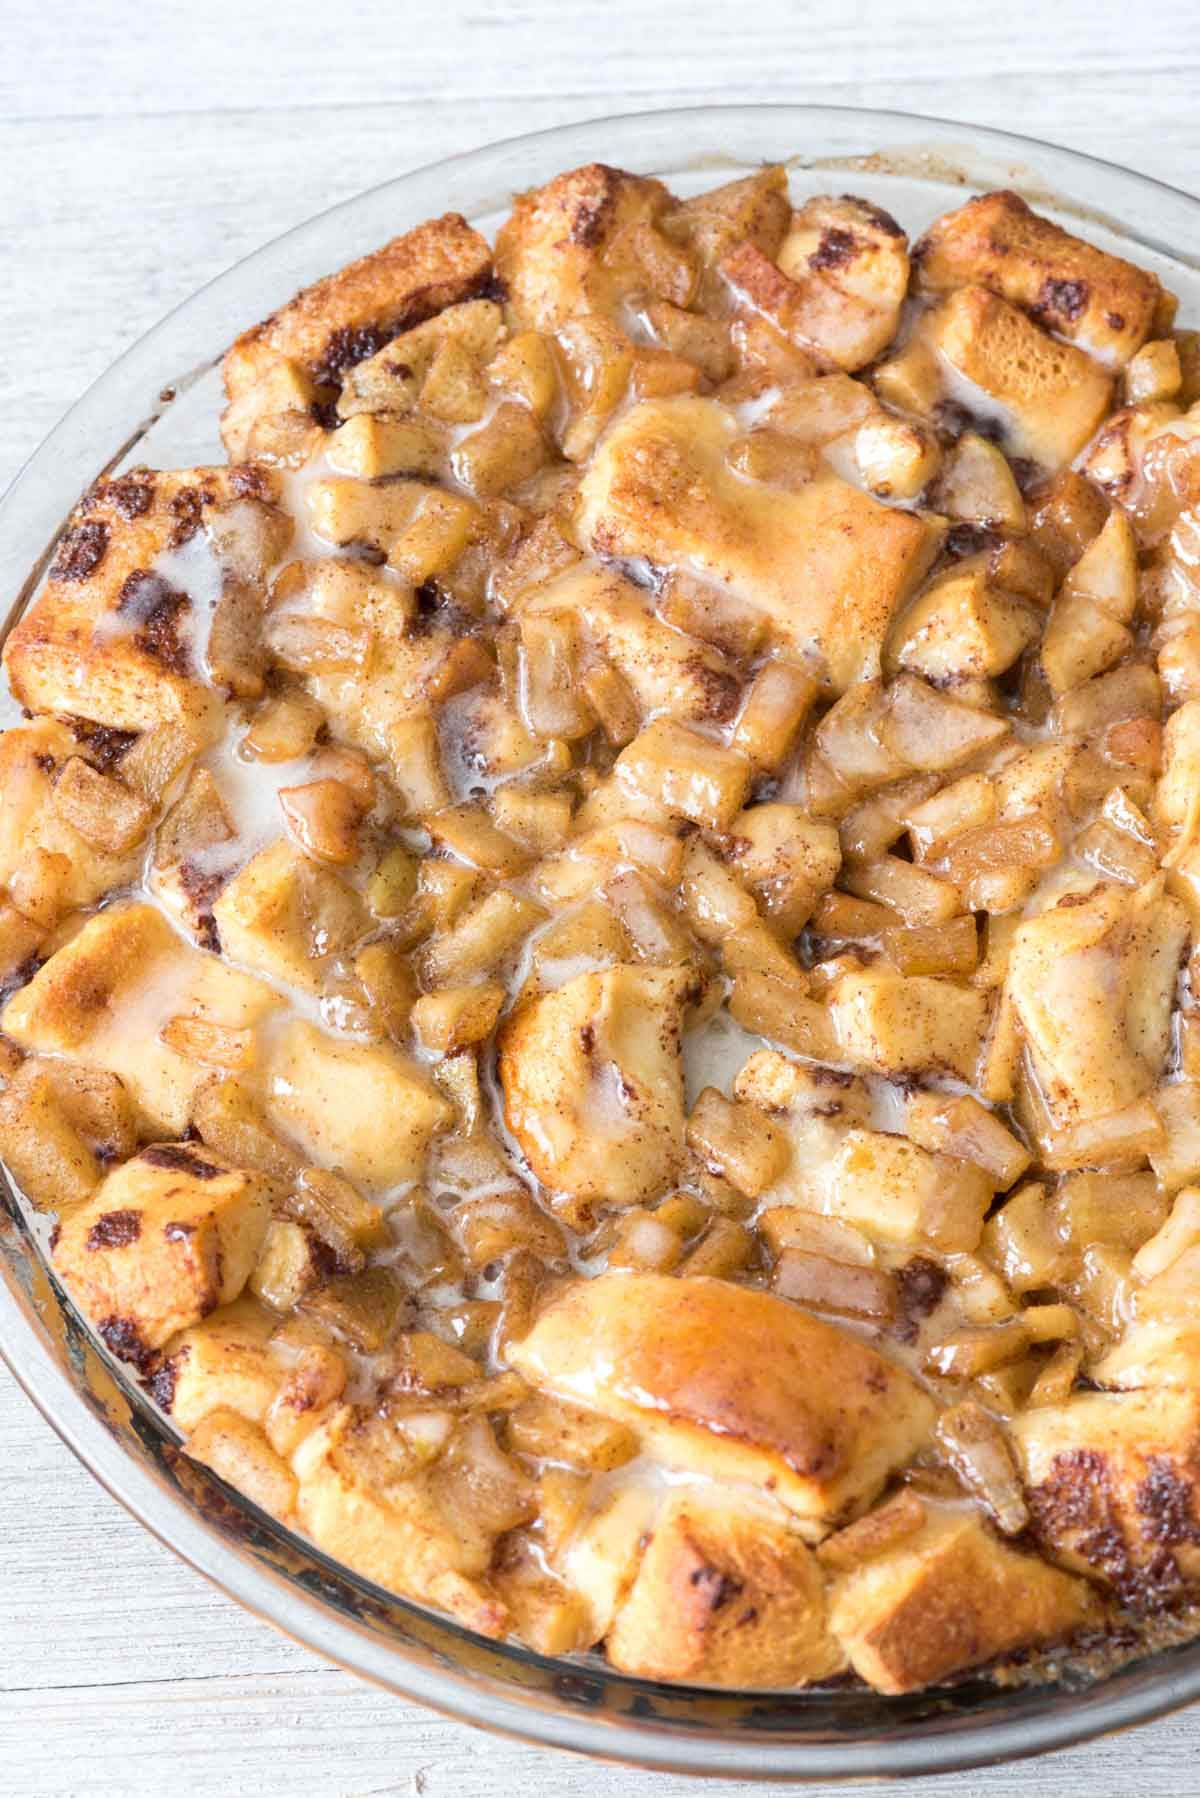 Apple Fritter Cinnamon Roll Bake - Crazy for Crust